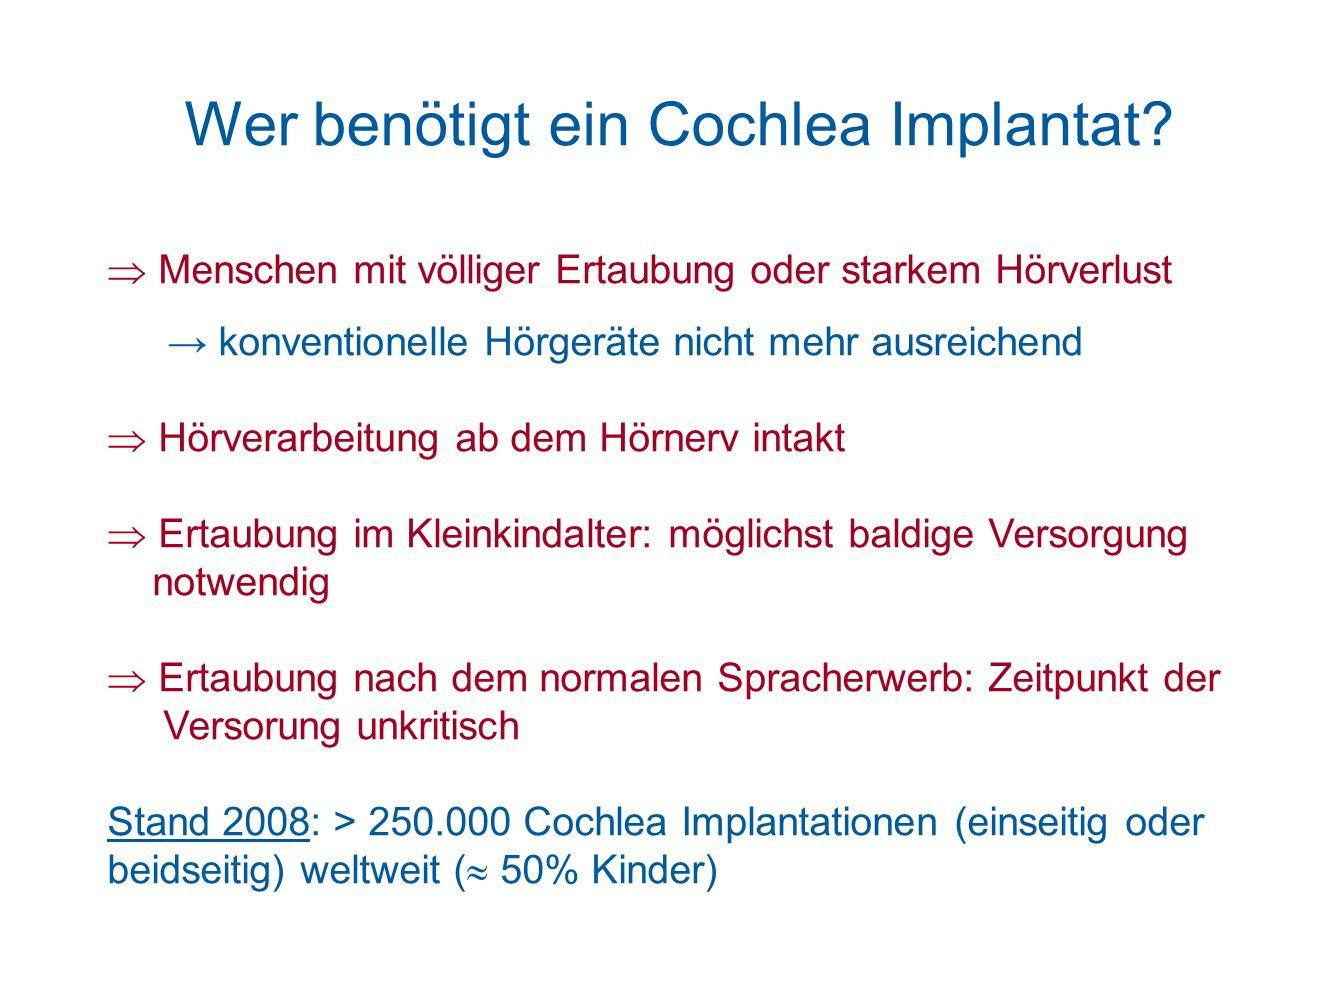 Wer benötigt ein Cochlea Implantat